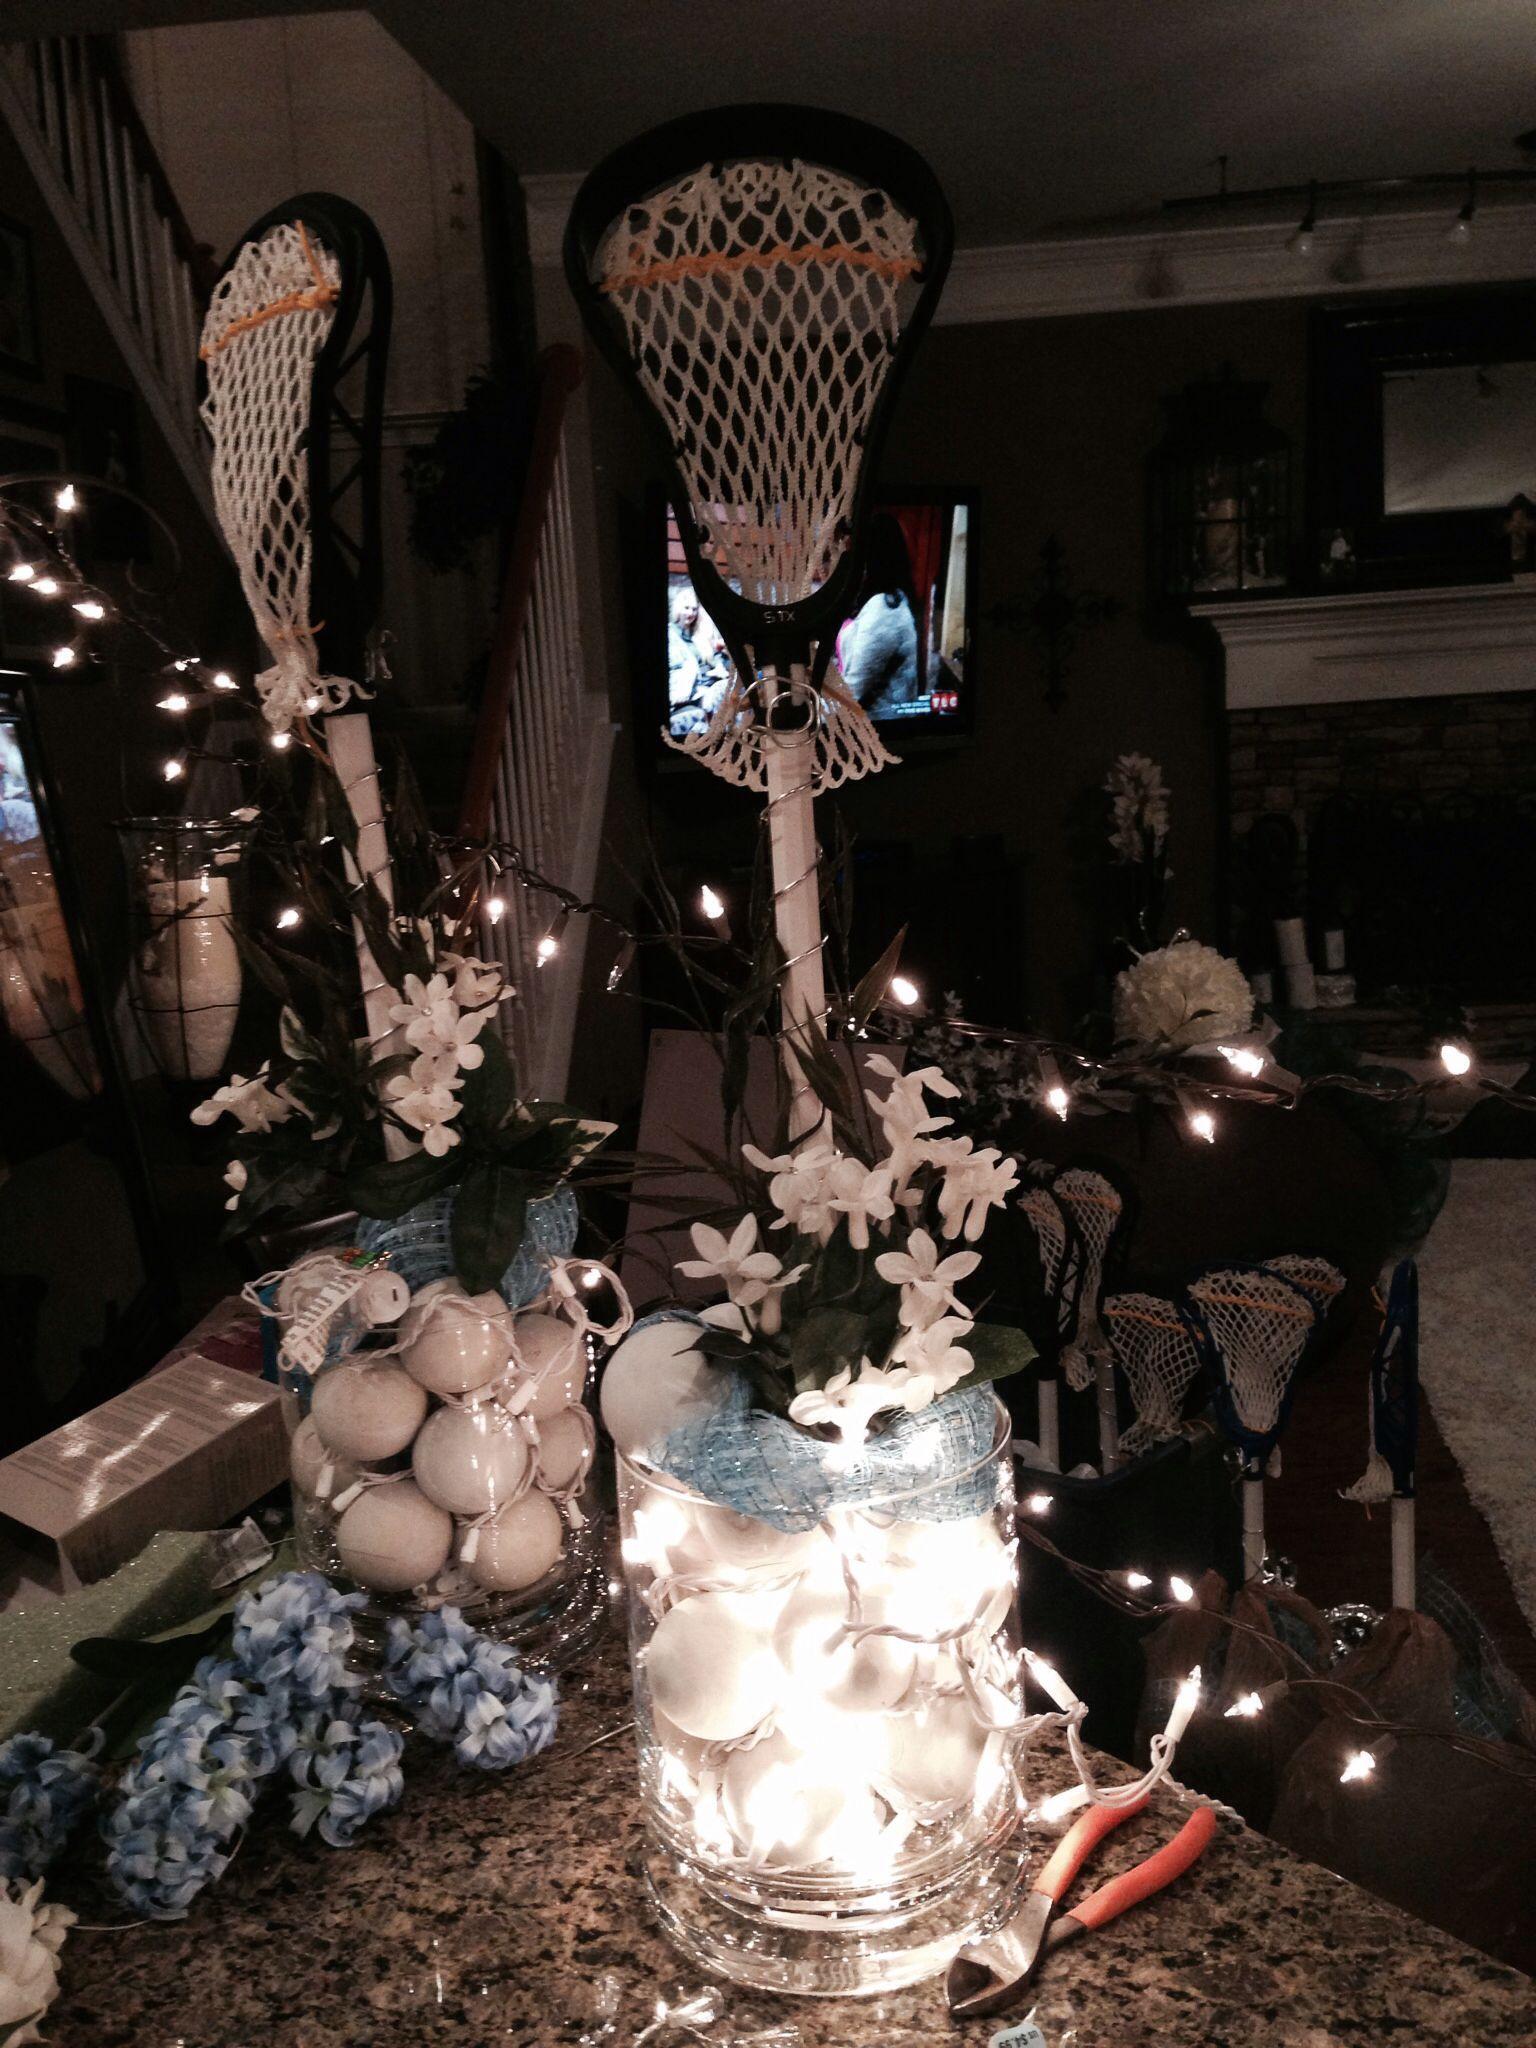 Lax banquet decoration sports banquet sports banquet